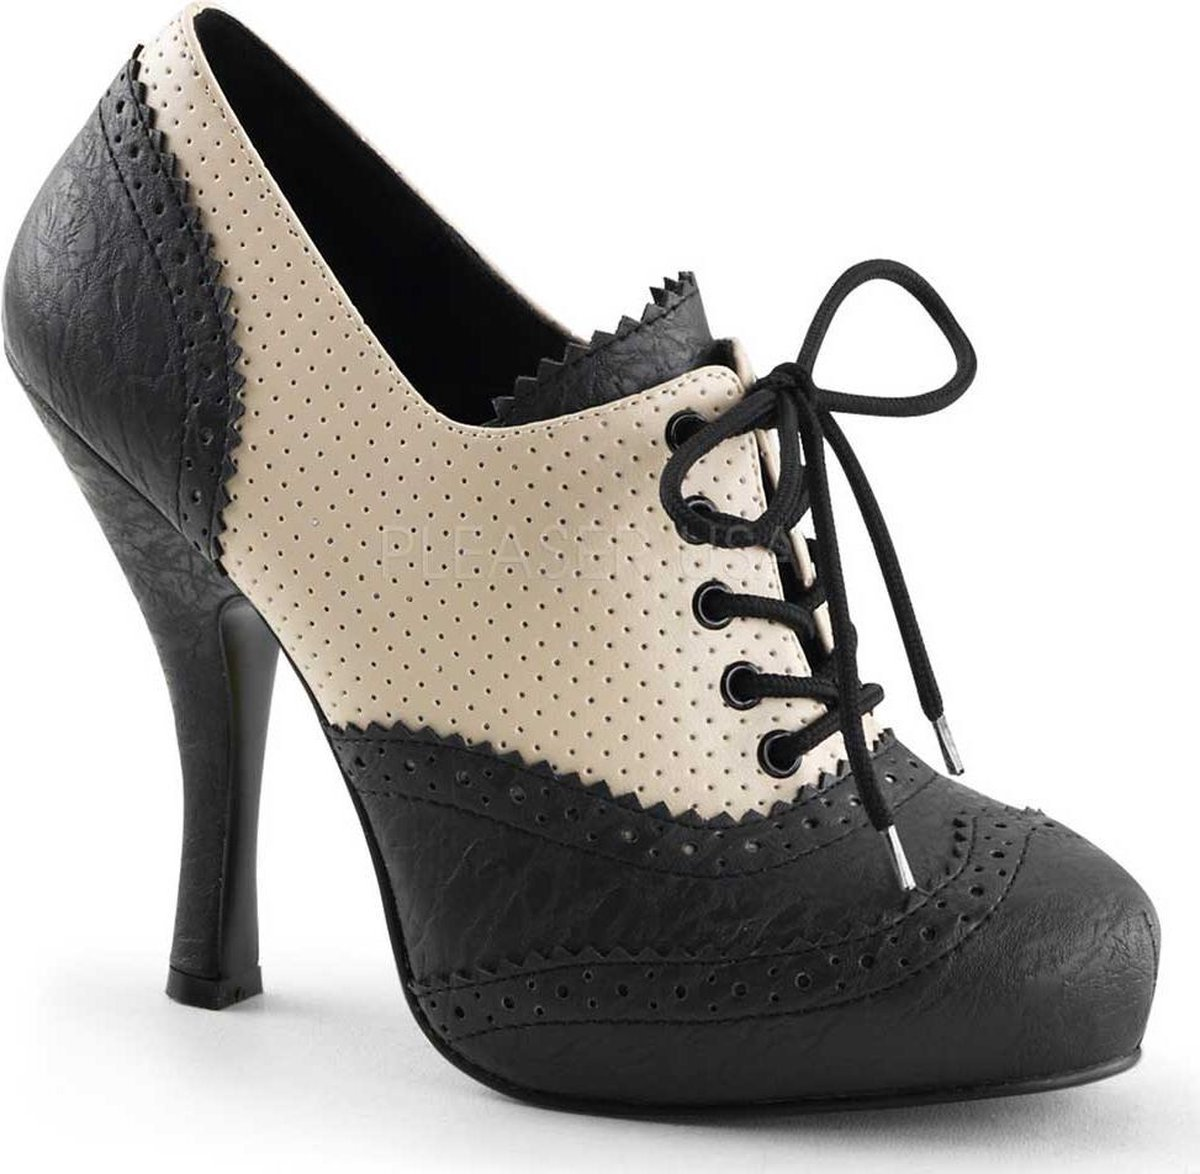 Pin Up Couture Lage schoenen 36 Shoes CUTIEPIE 14 US 6 CremeZwart